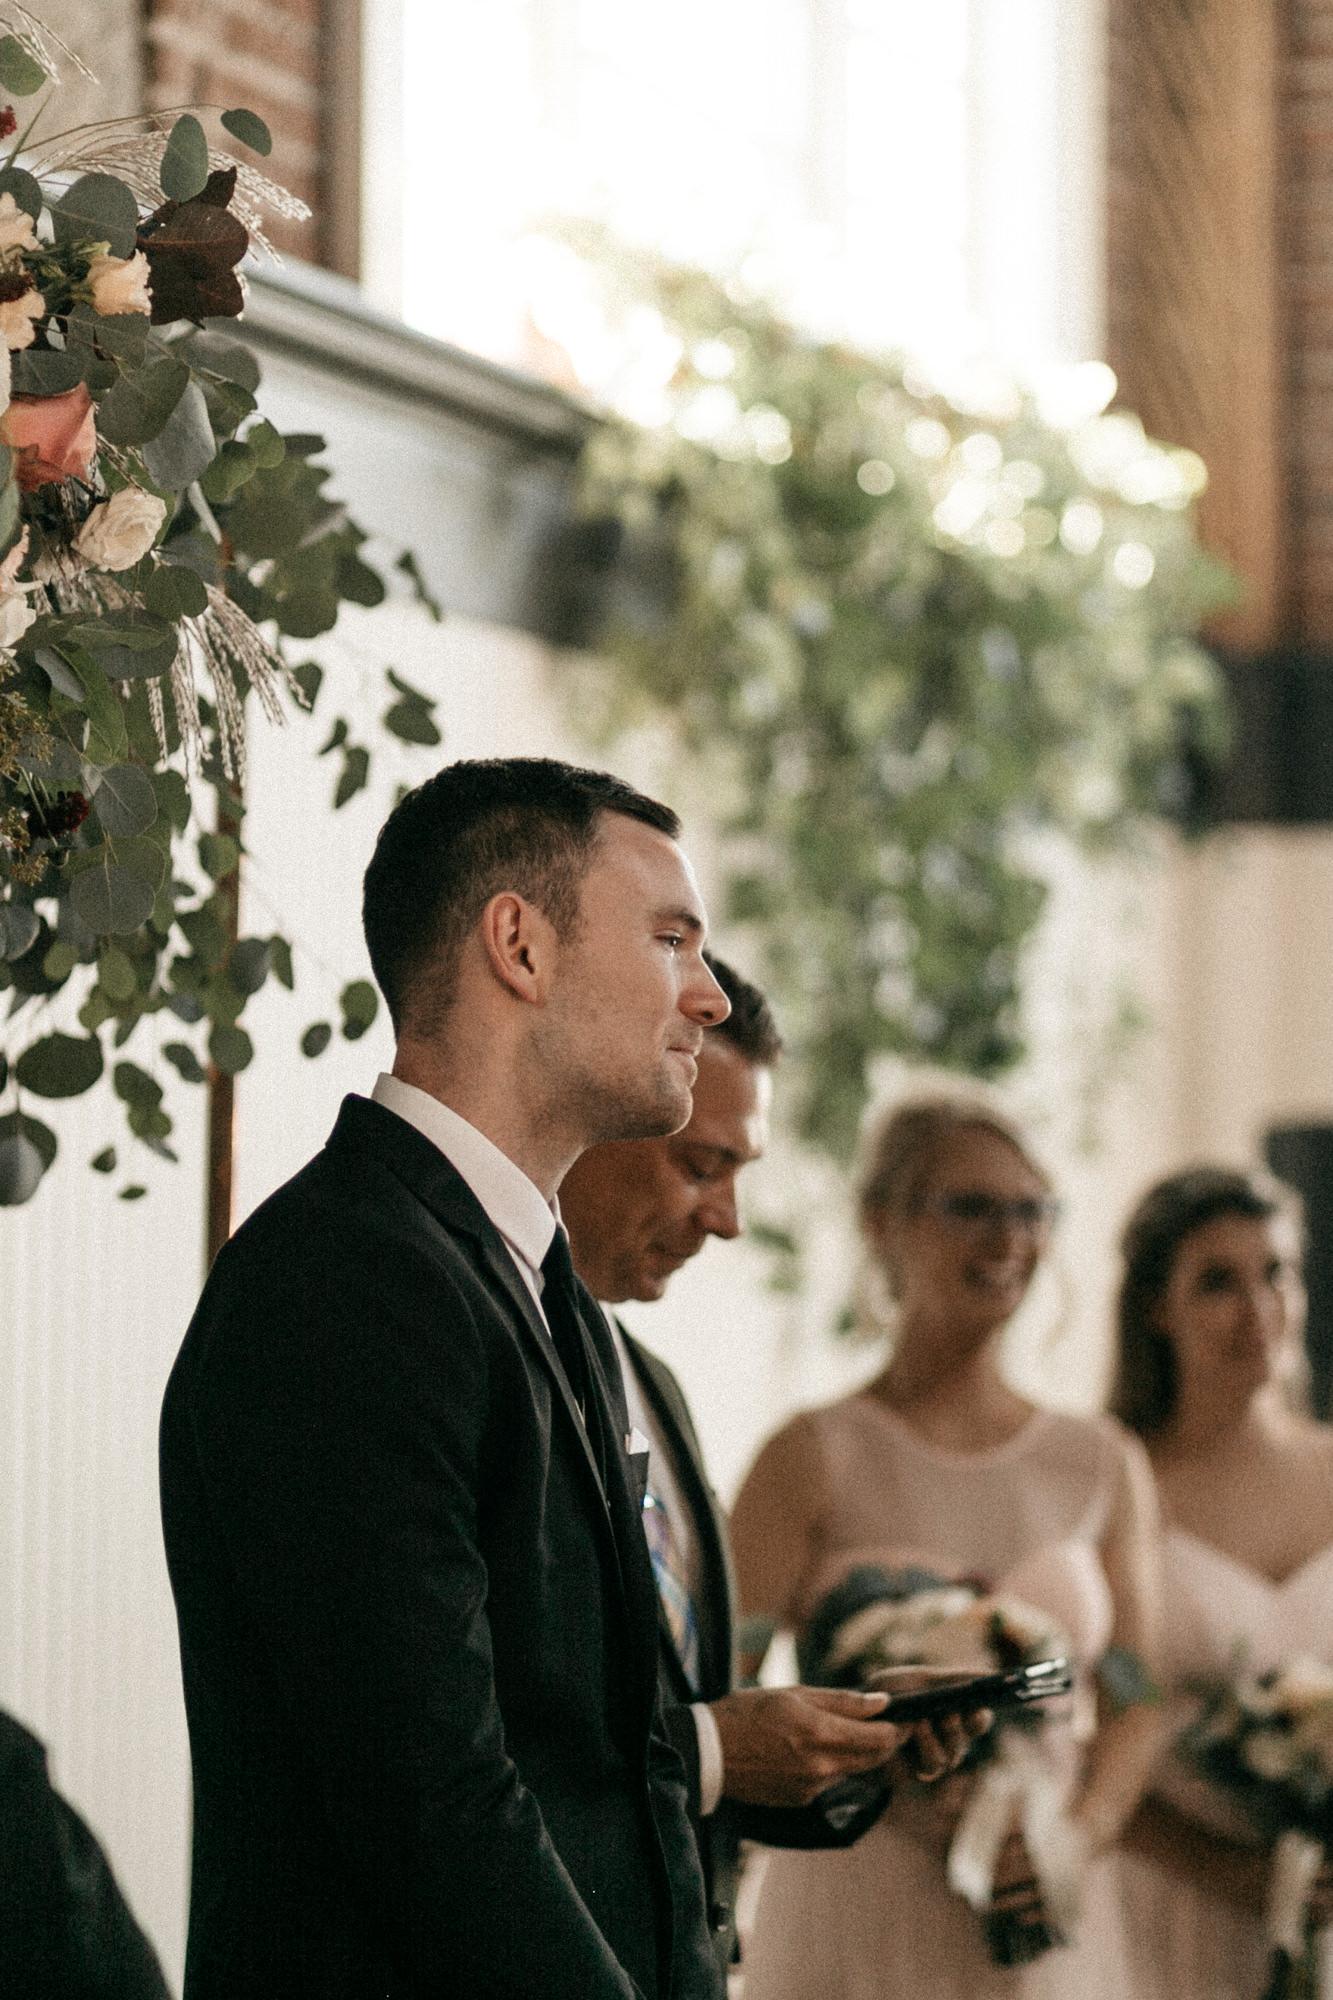 the_evergreen_portland_wedding-65.jpg